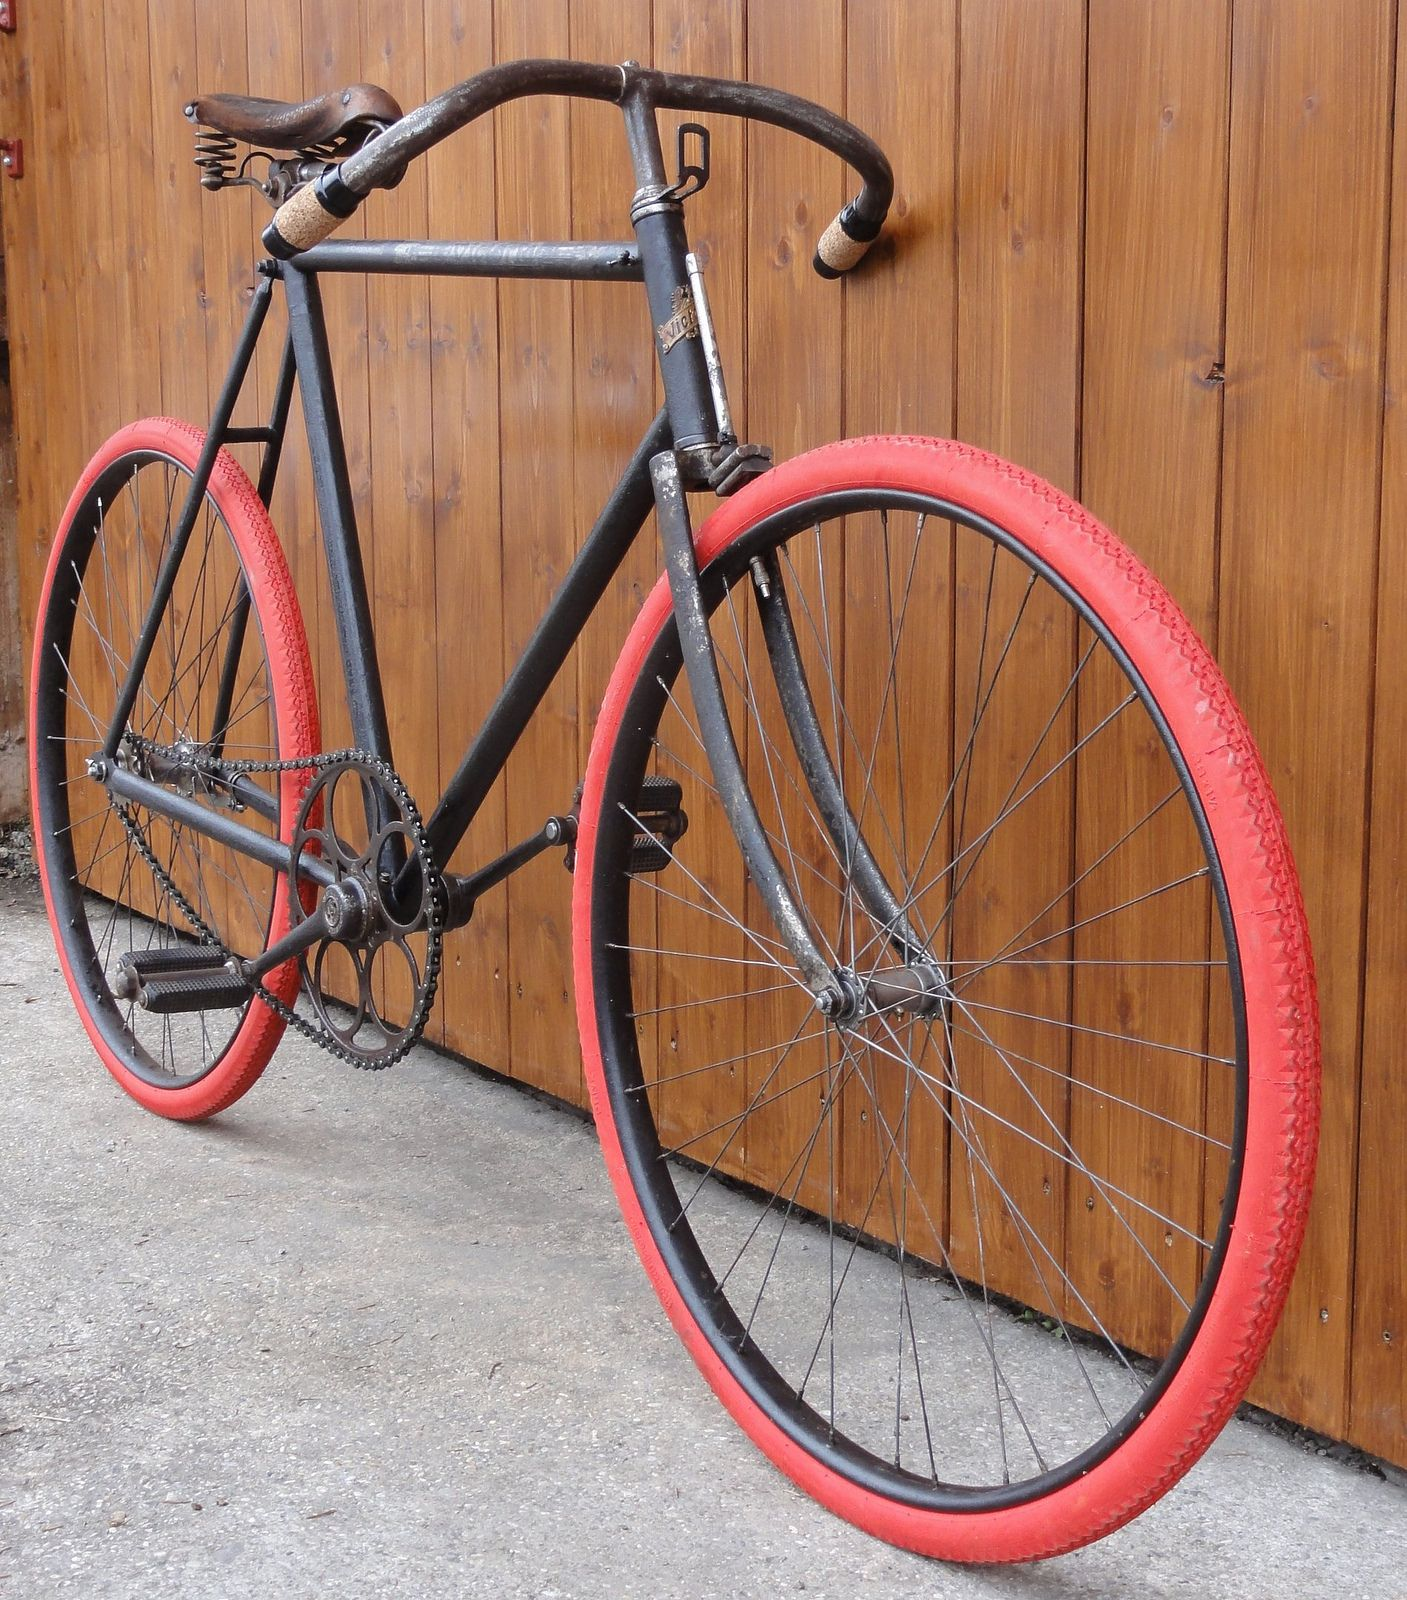 1906 Victoria Retro Bicycle Vintage Racing Bike Bike Restoration